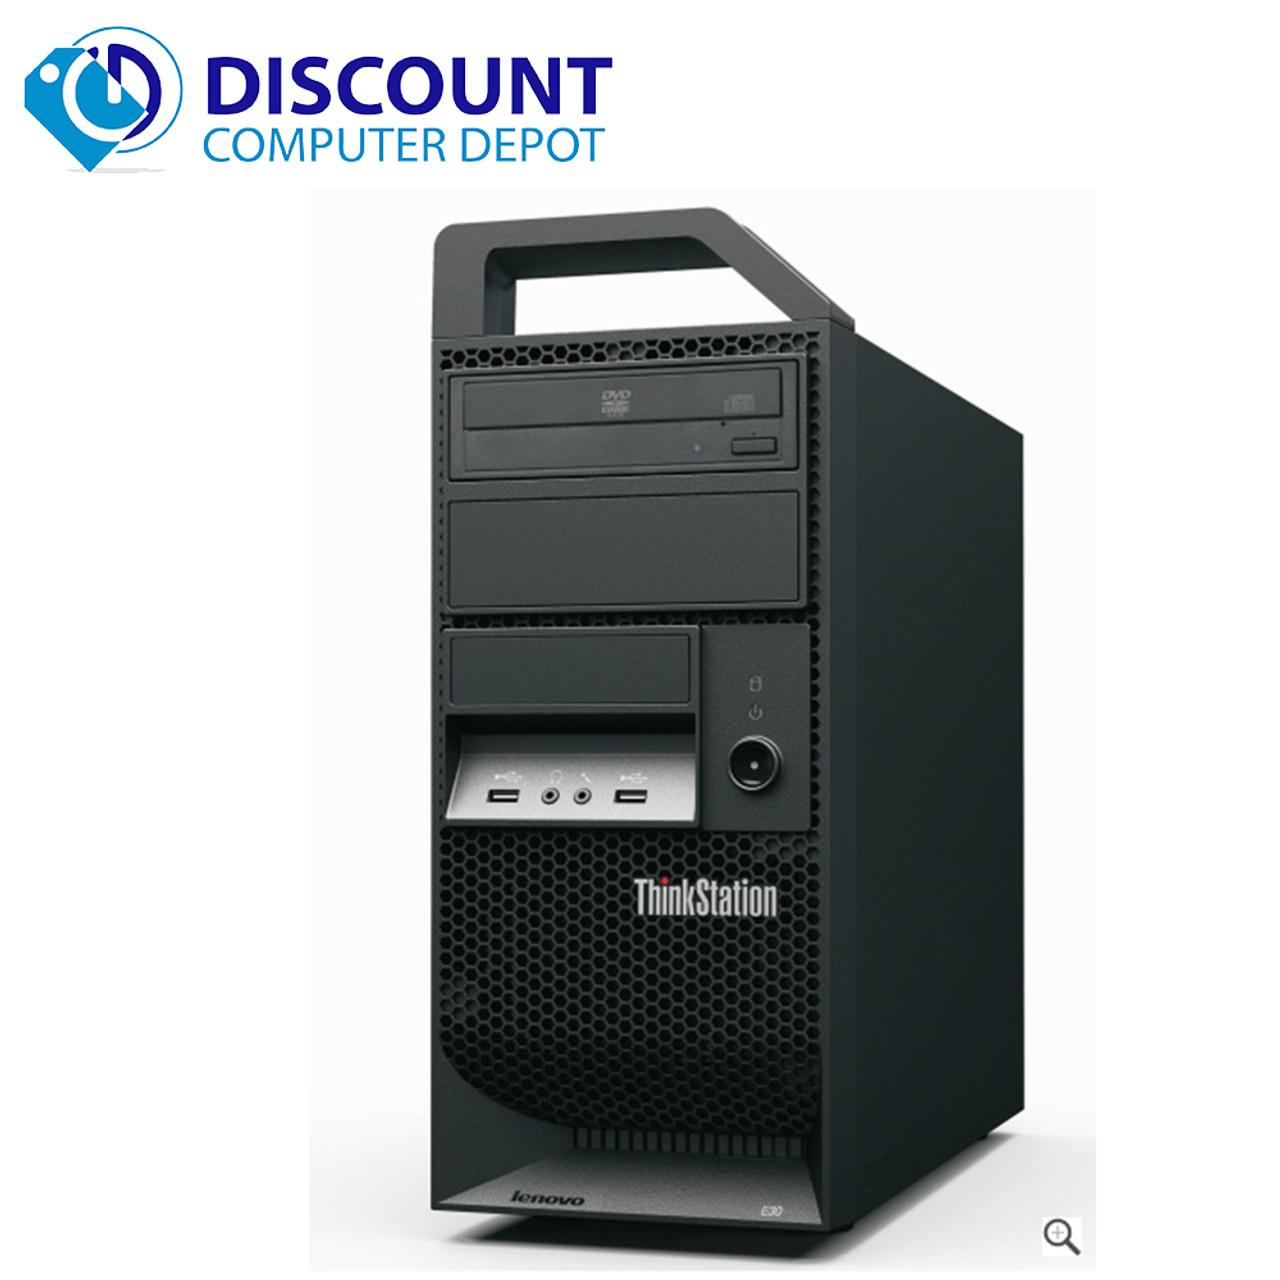 Lenovo ThinkStation E20 USB Keyboard Download Driver